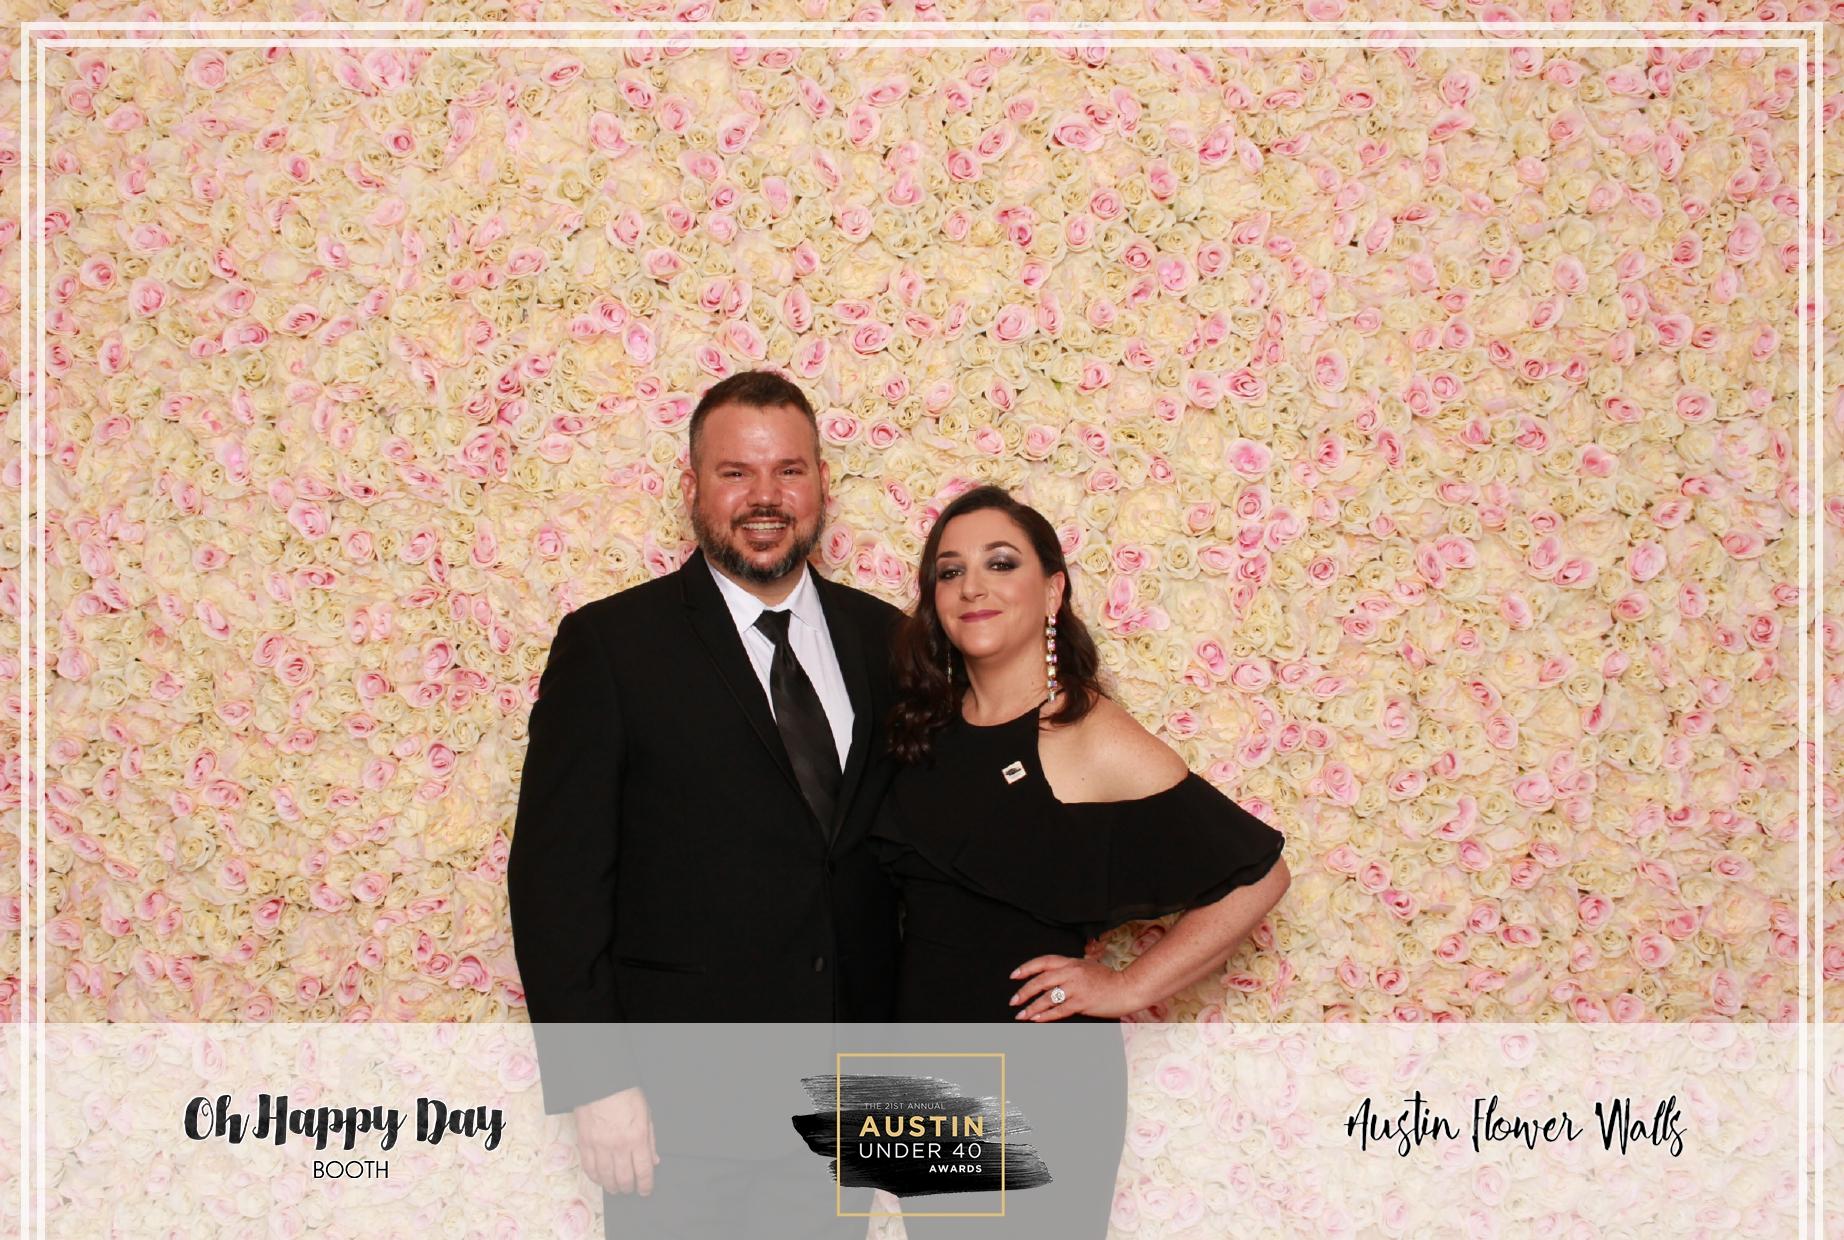 Oh Happy Day Booth - Austin Under 40-34.jpg